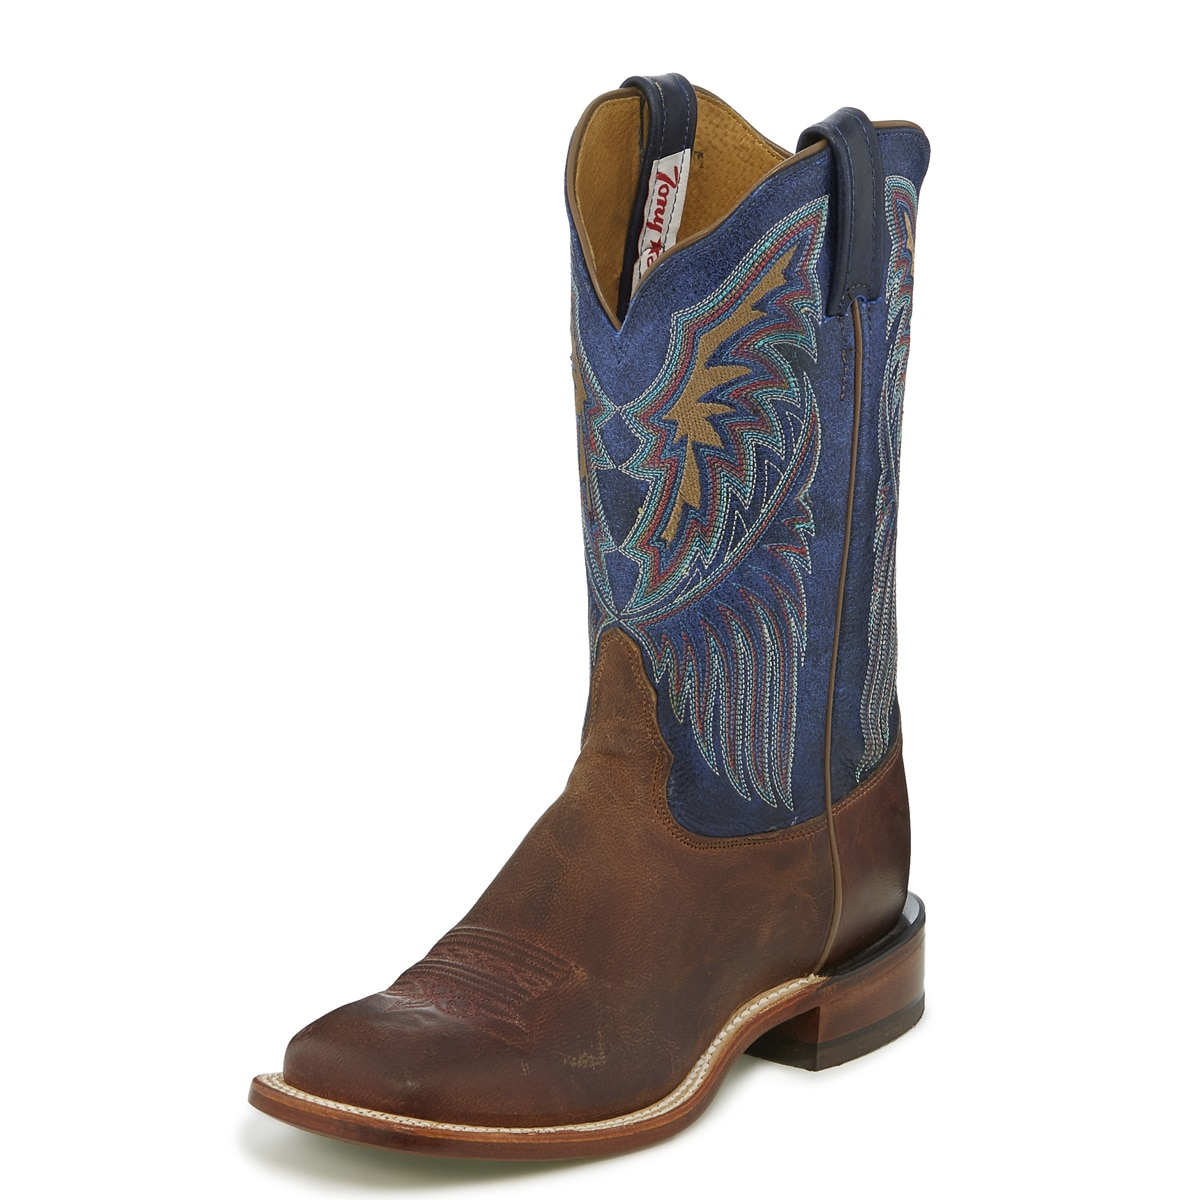 Tony Lama Women's Dava Boot